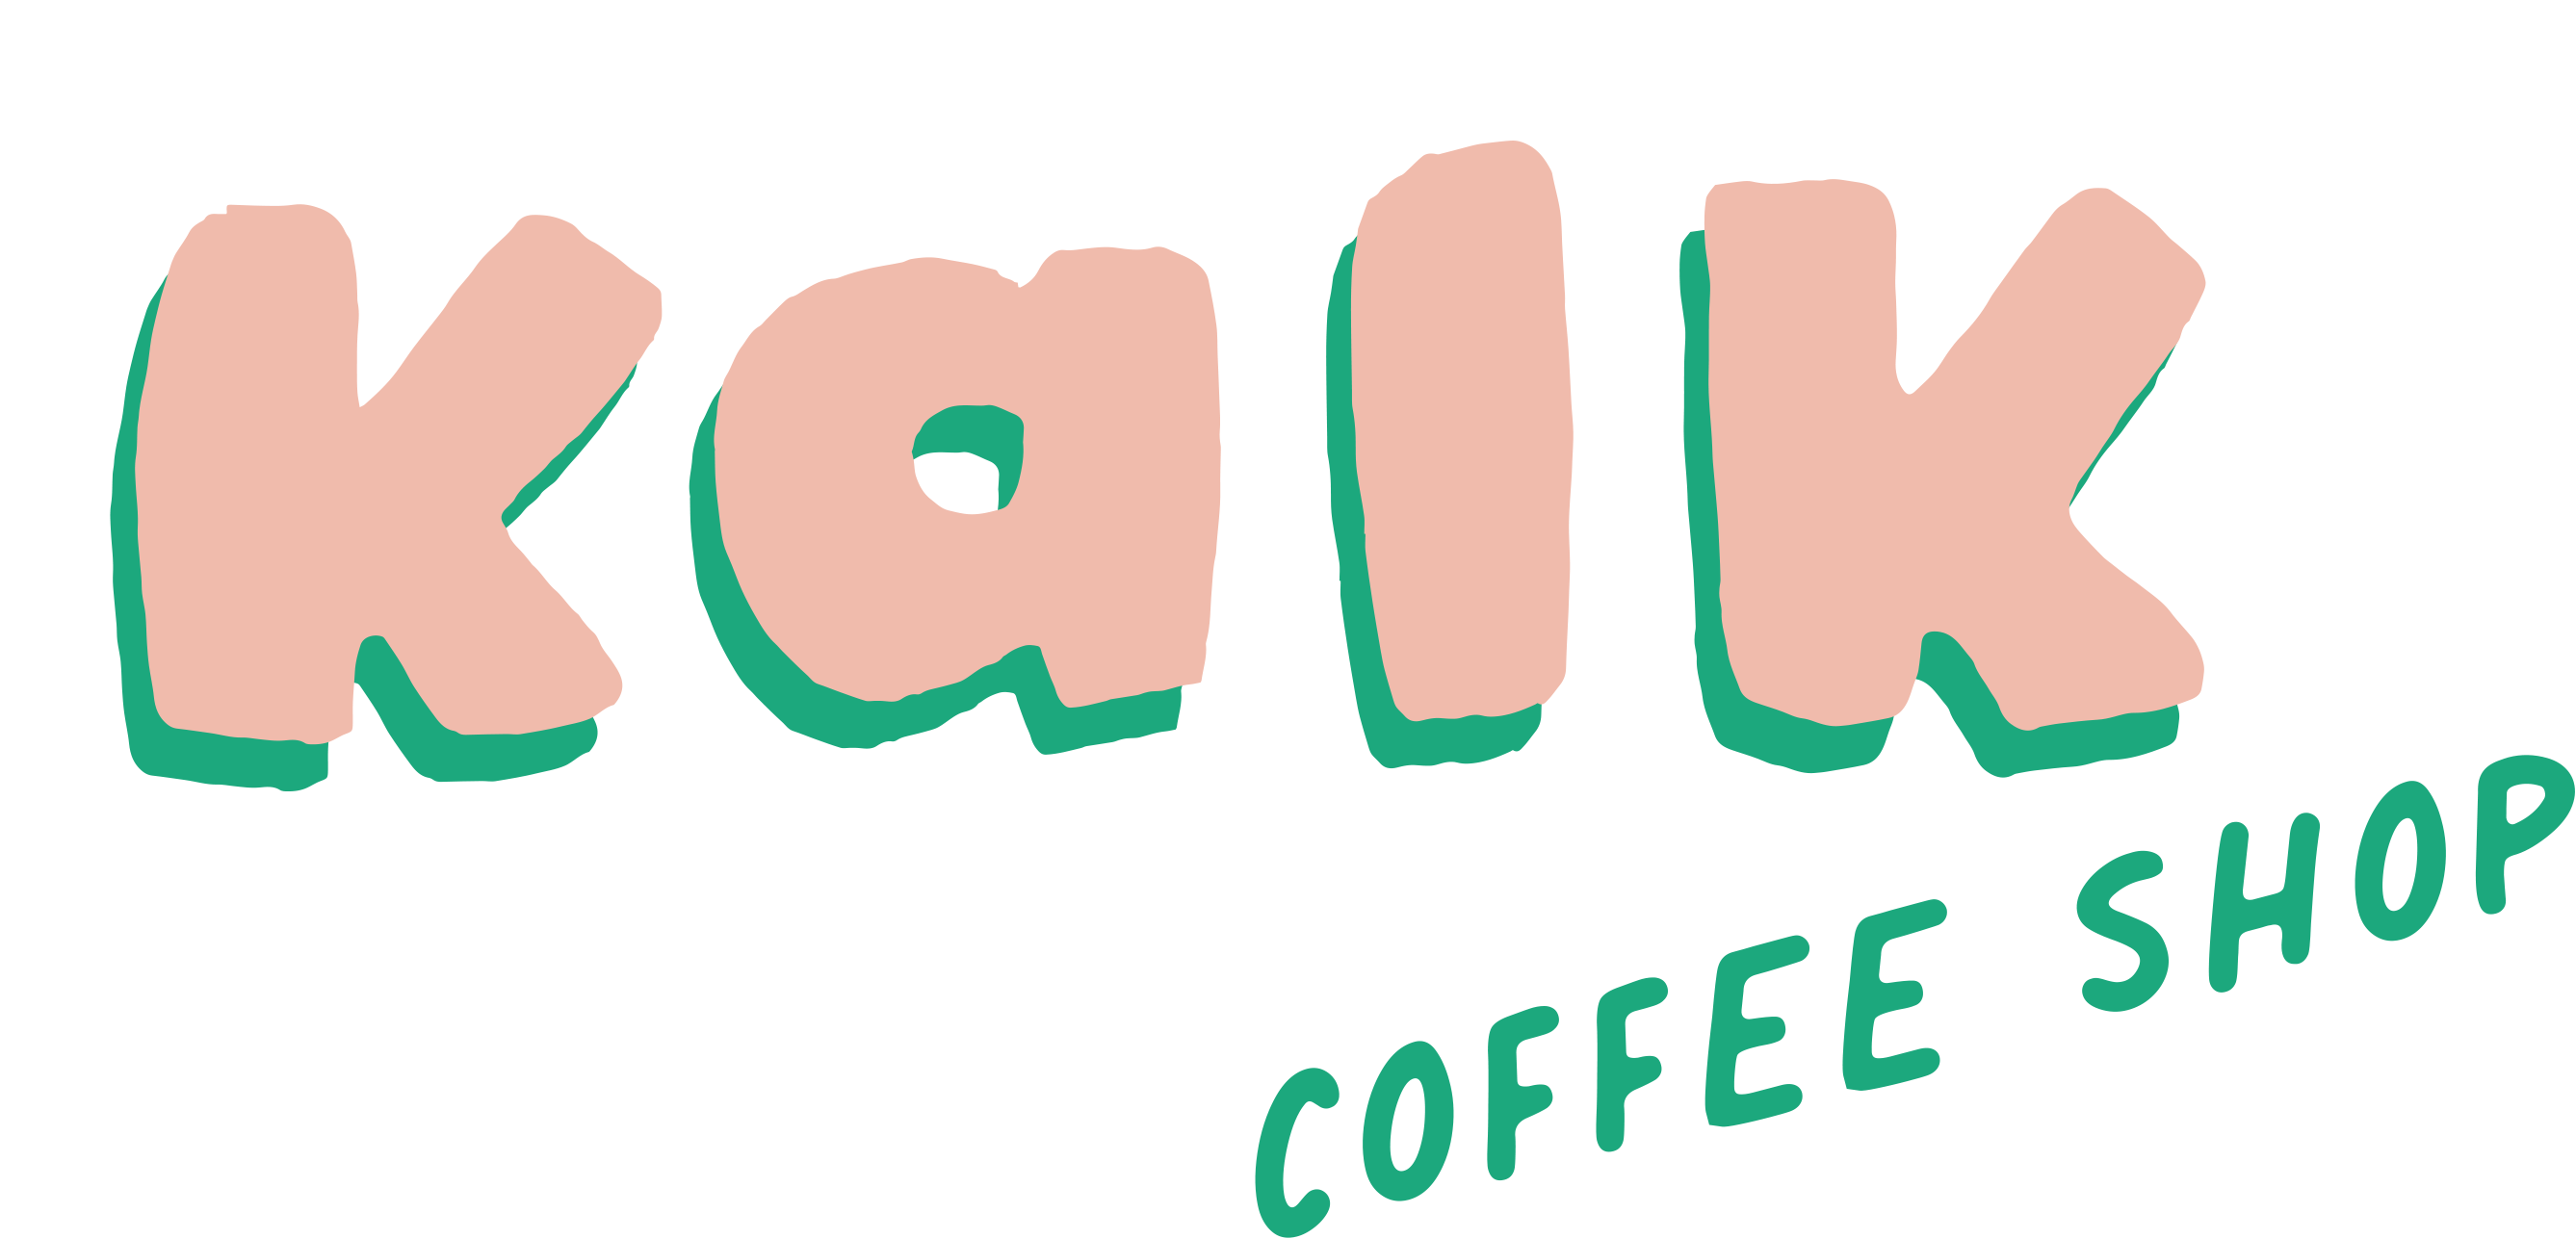 Kalk Coffee Shop